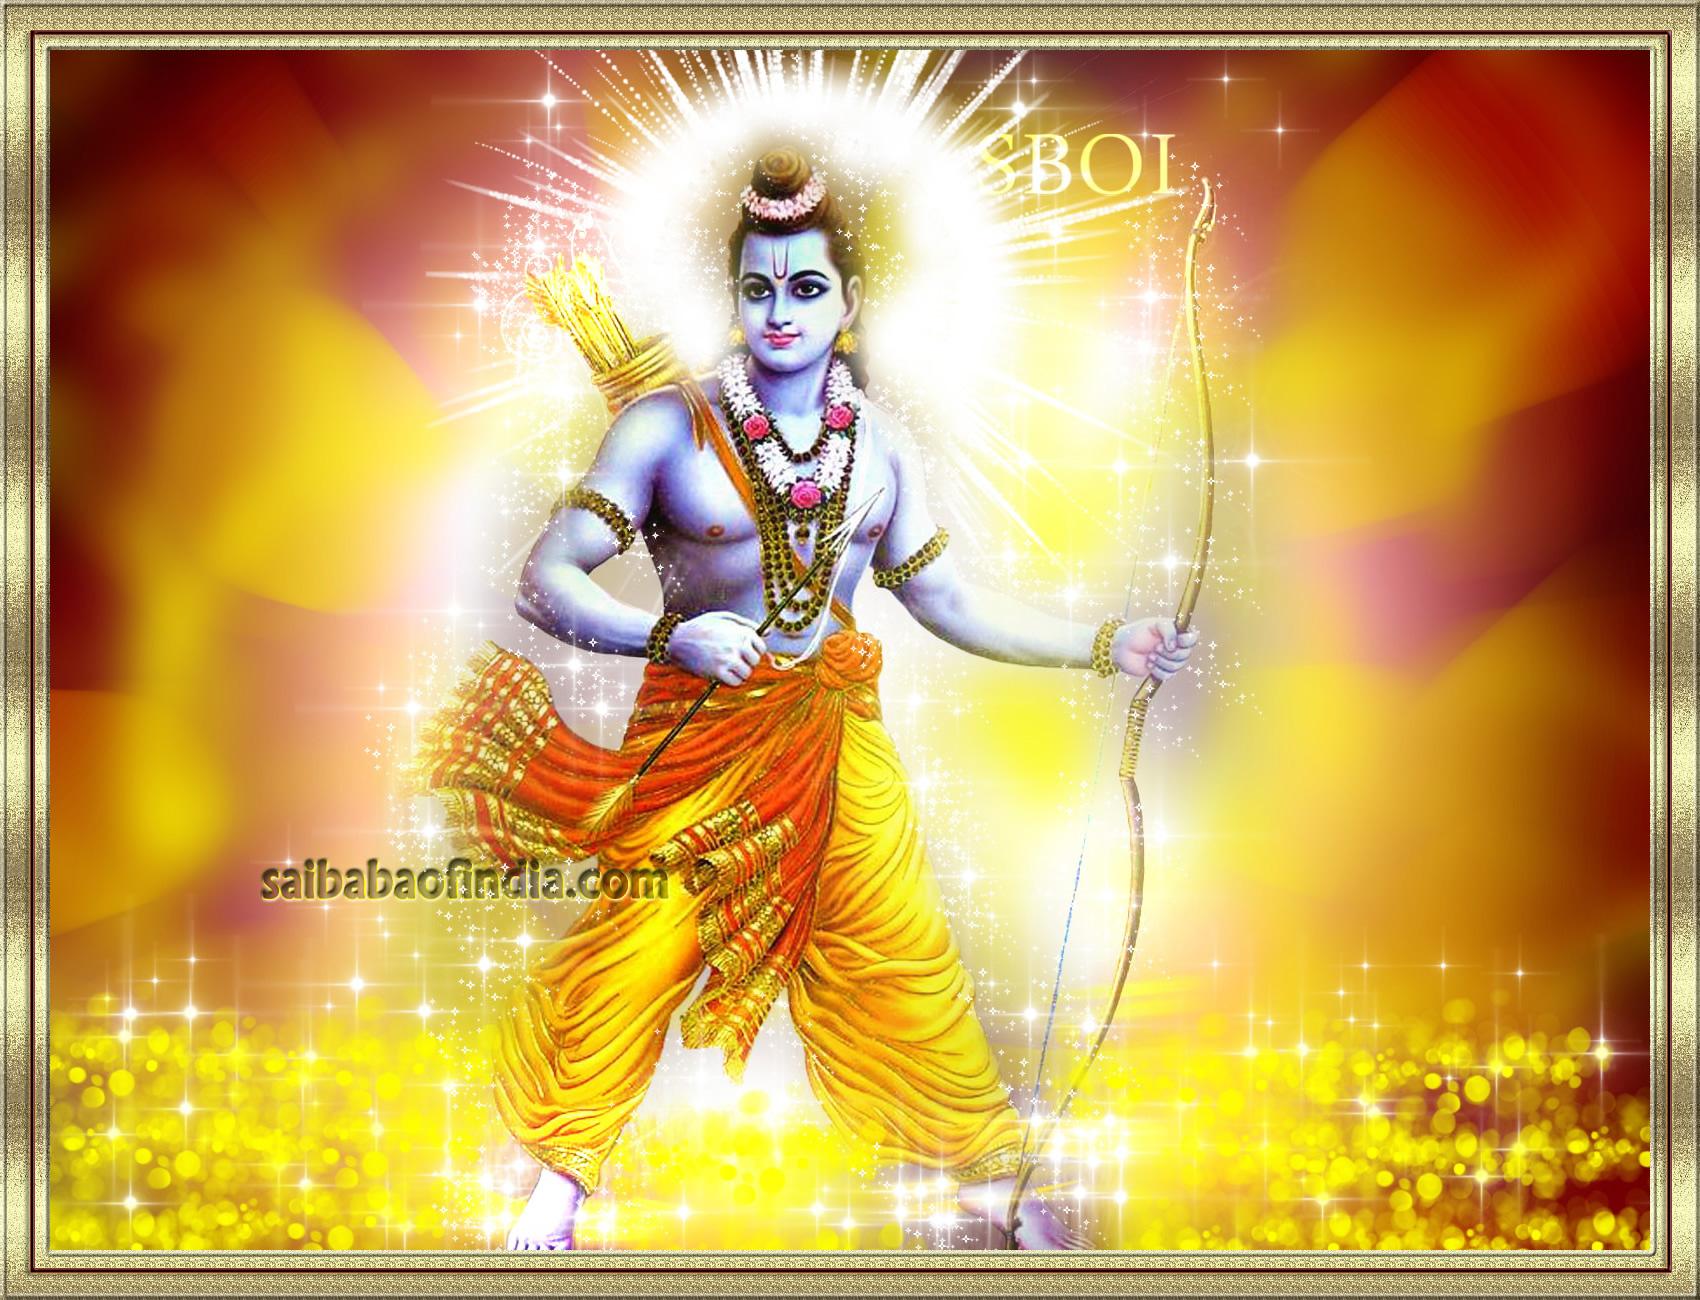 Wonderful Wallpaper Lord Ram Darbar - lord-rama-wallpaper-with-bow-and-arrow-ramanavami  Image_97554.jpg